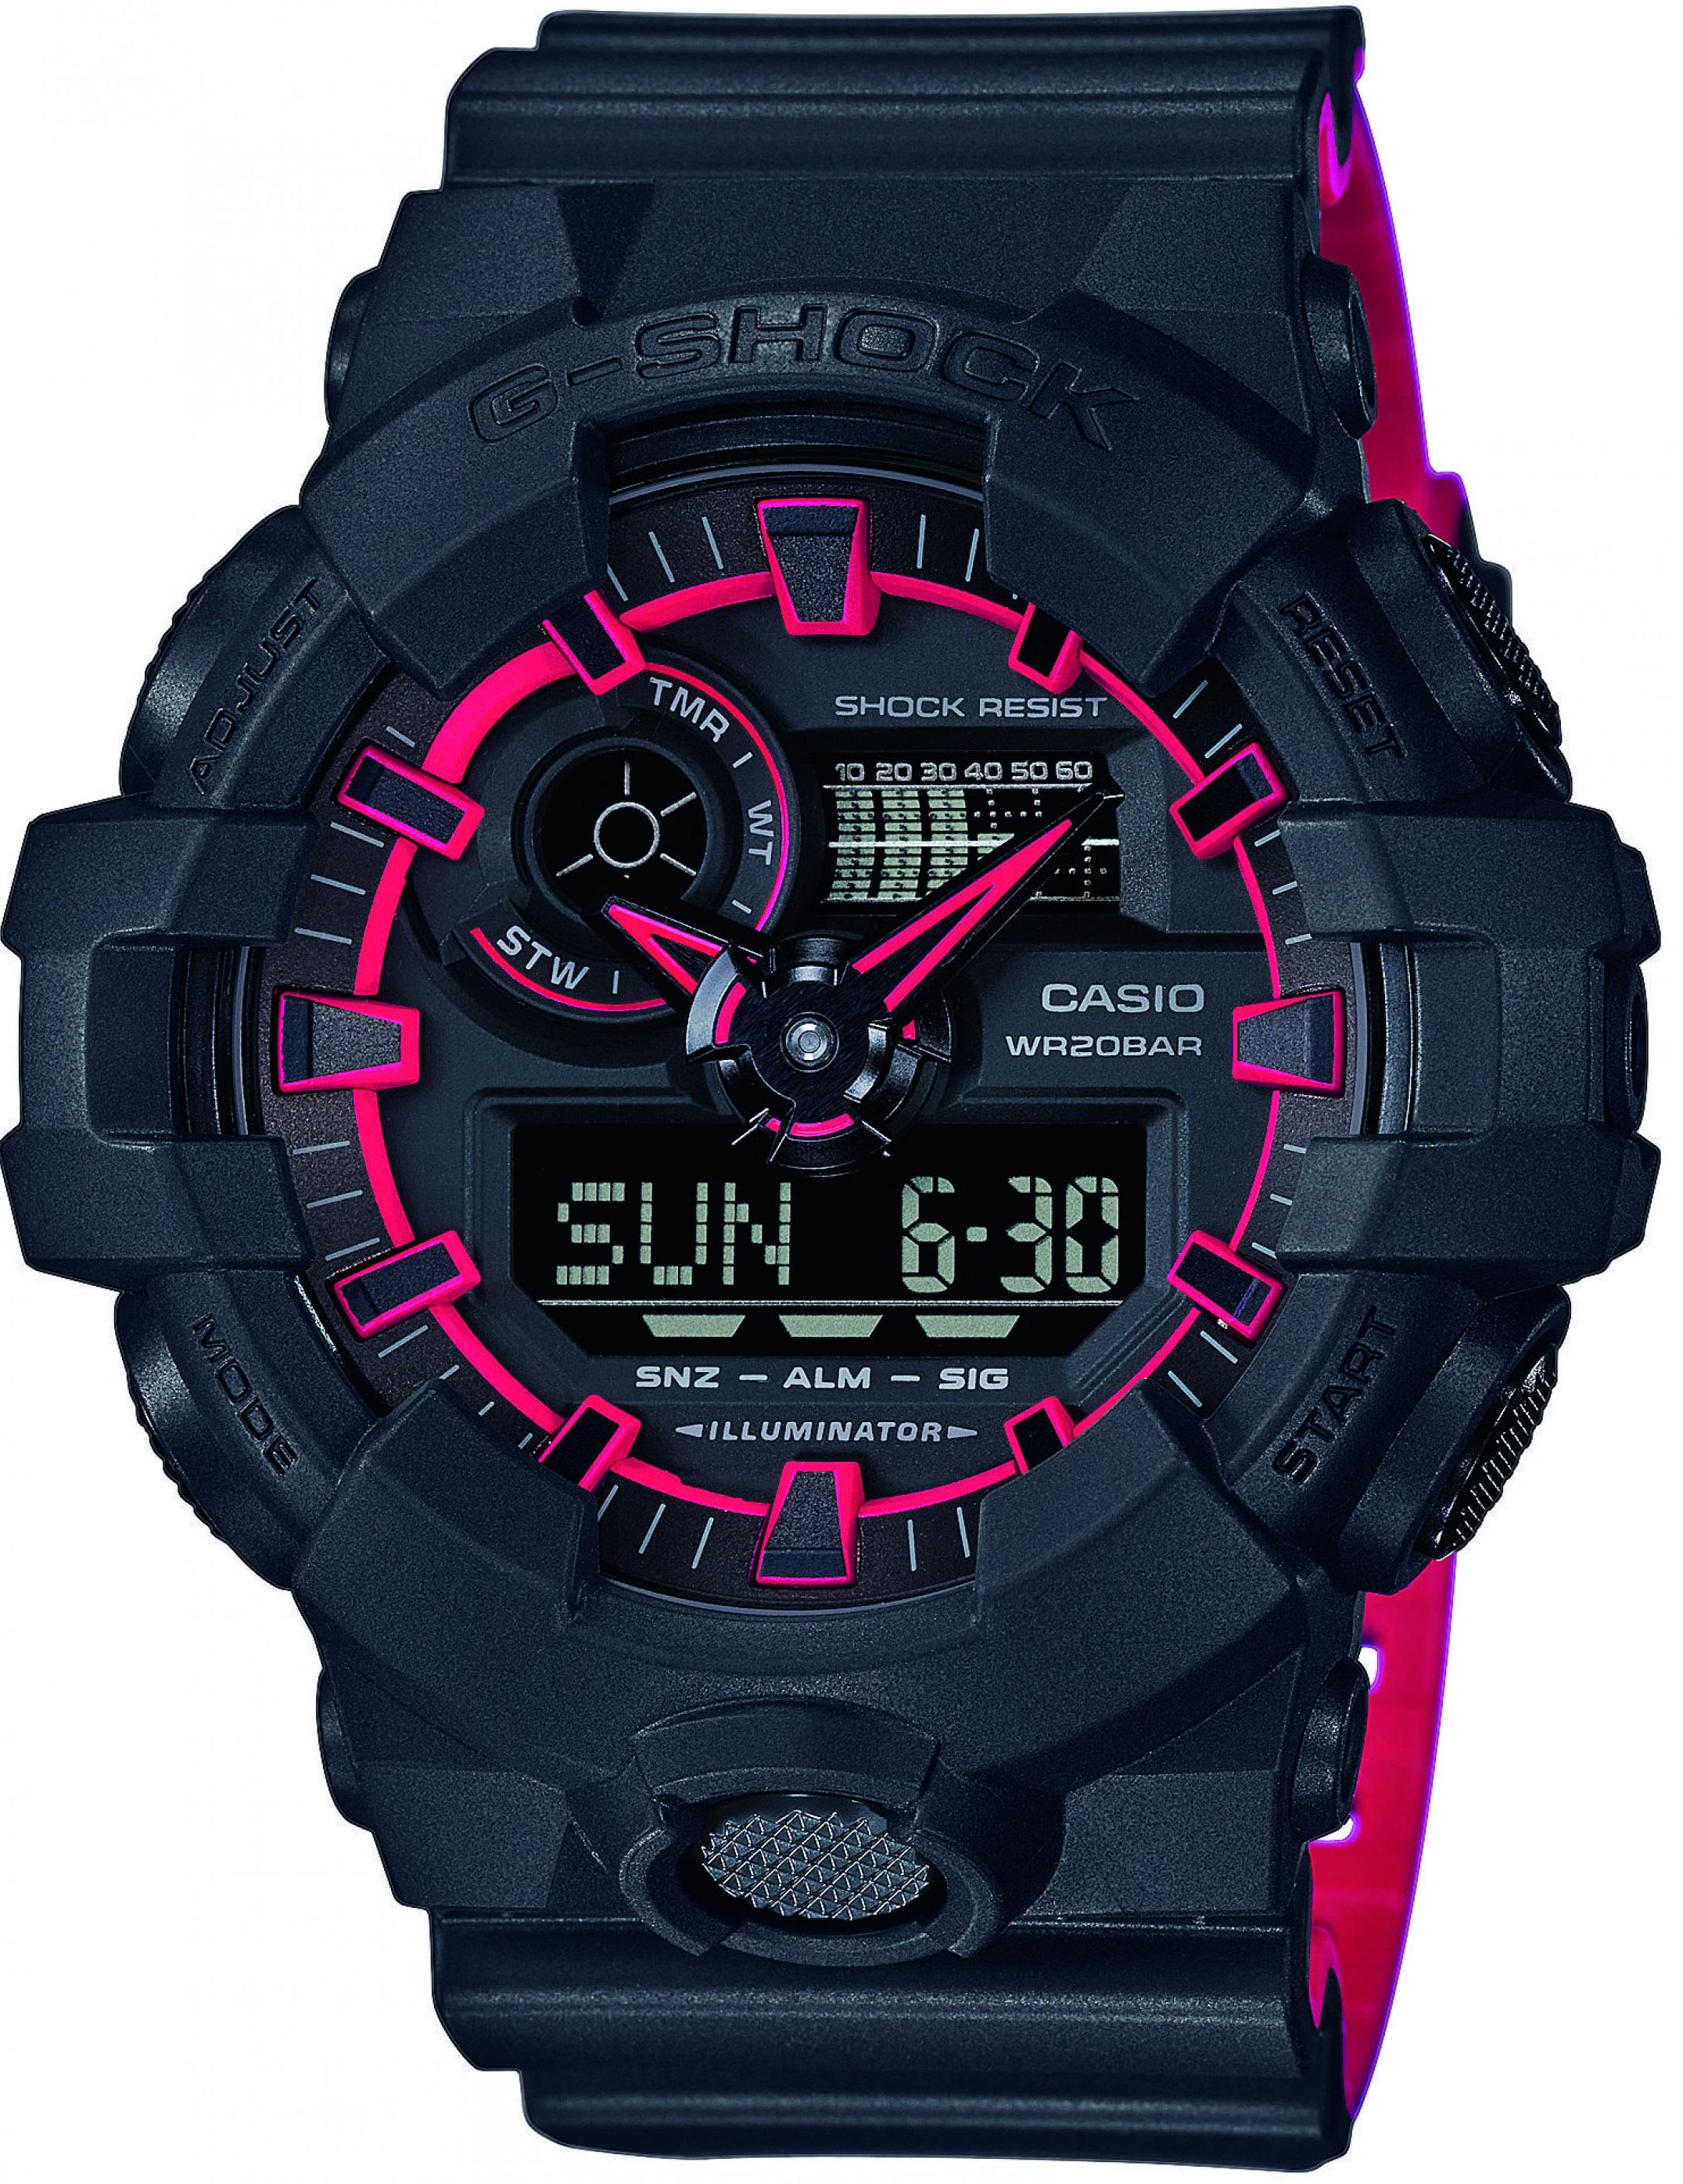 Мужские часы Casio G-Shock GA-700SE-1A4ER